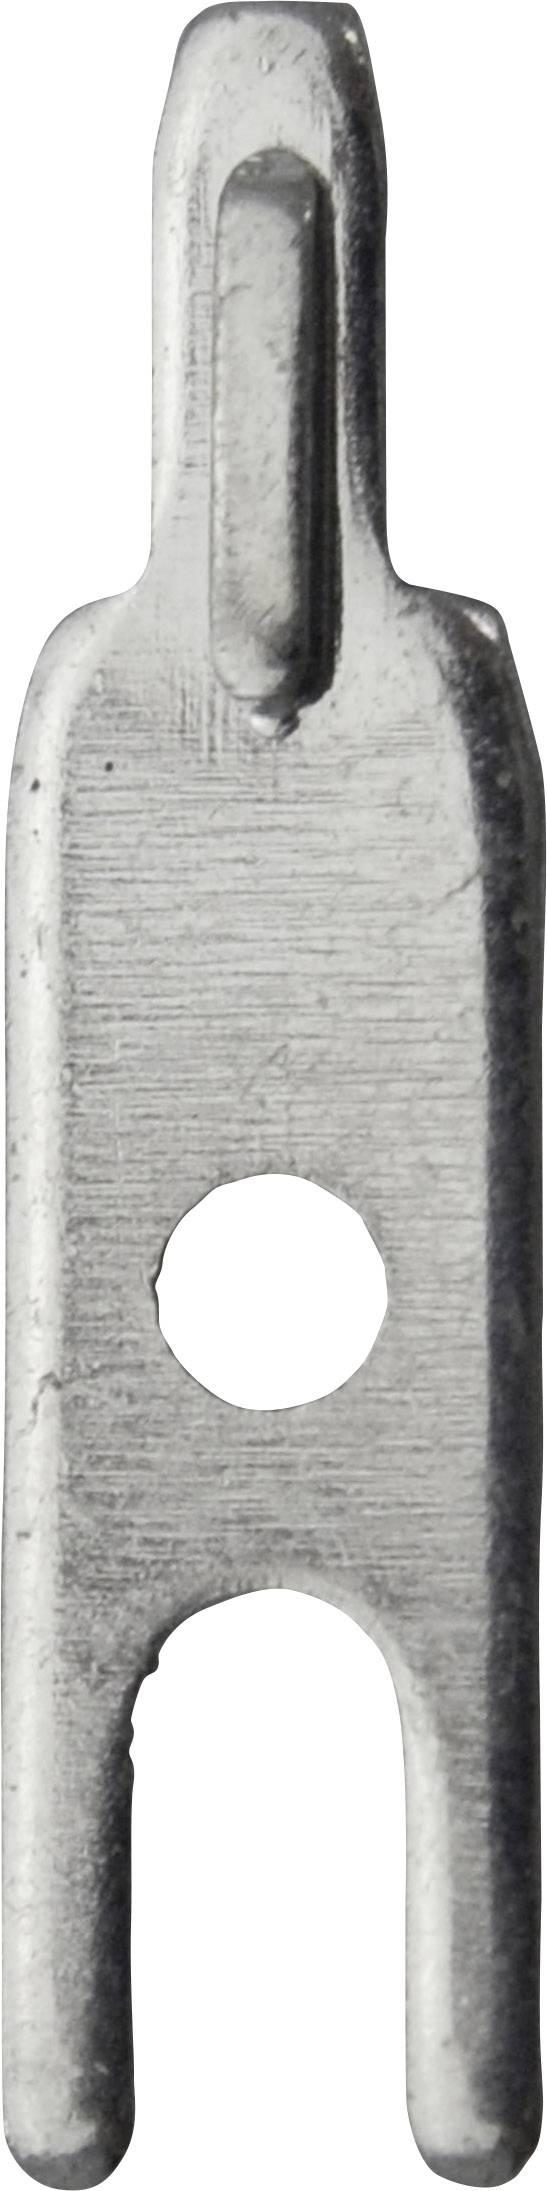 Vogt Verbindungstechnik  Lötöse Kontaktoberfläche verzinnt 100 St.